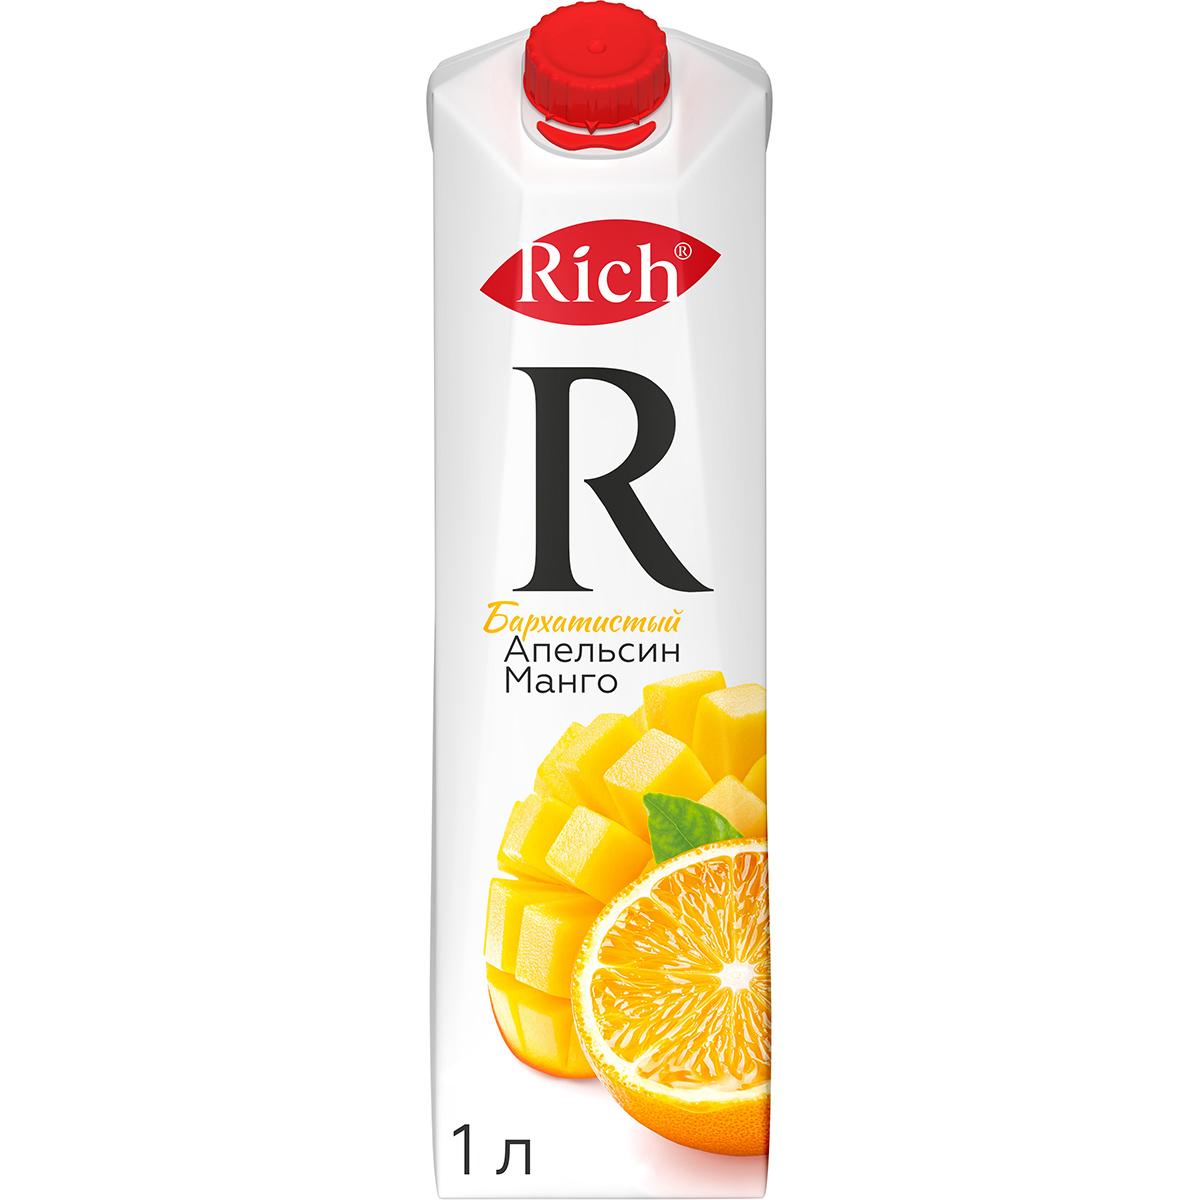 Нектар Rich Апельсин Манго 1 л нектар rich апельсин манго 1 л